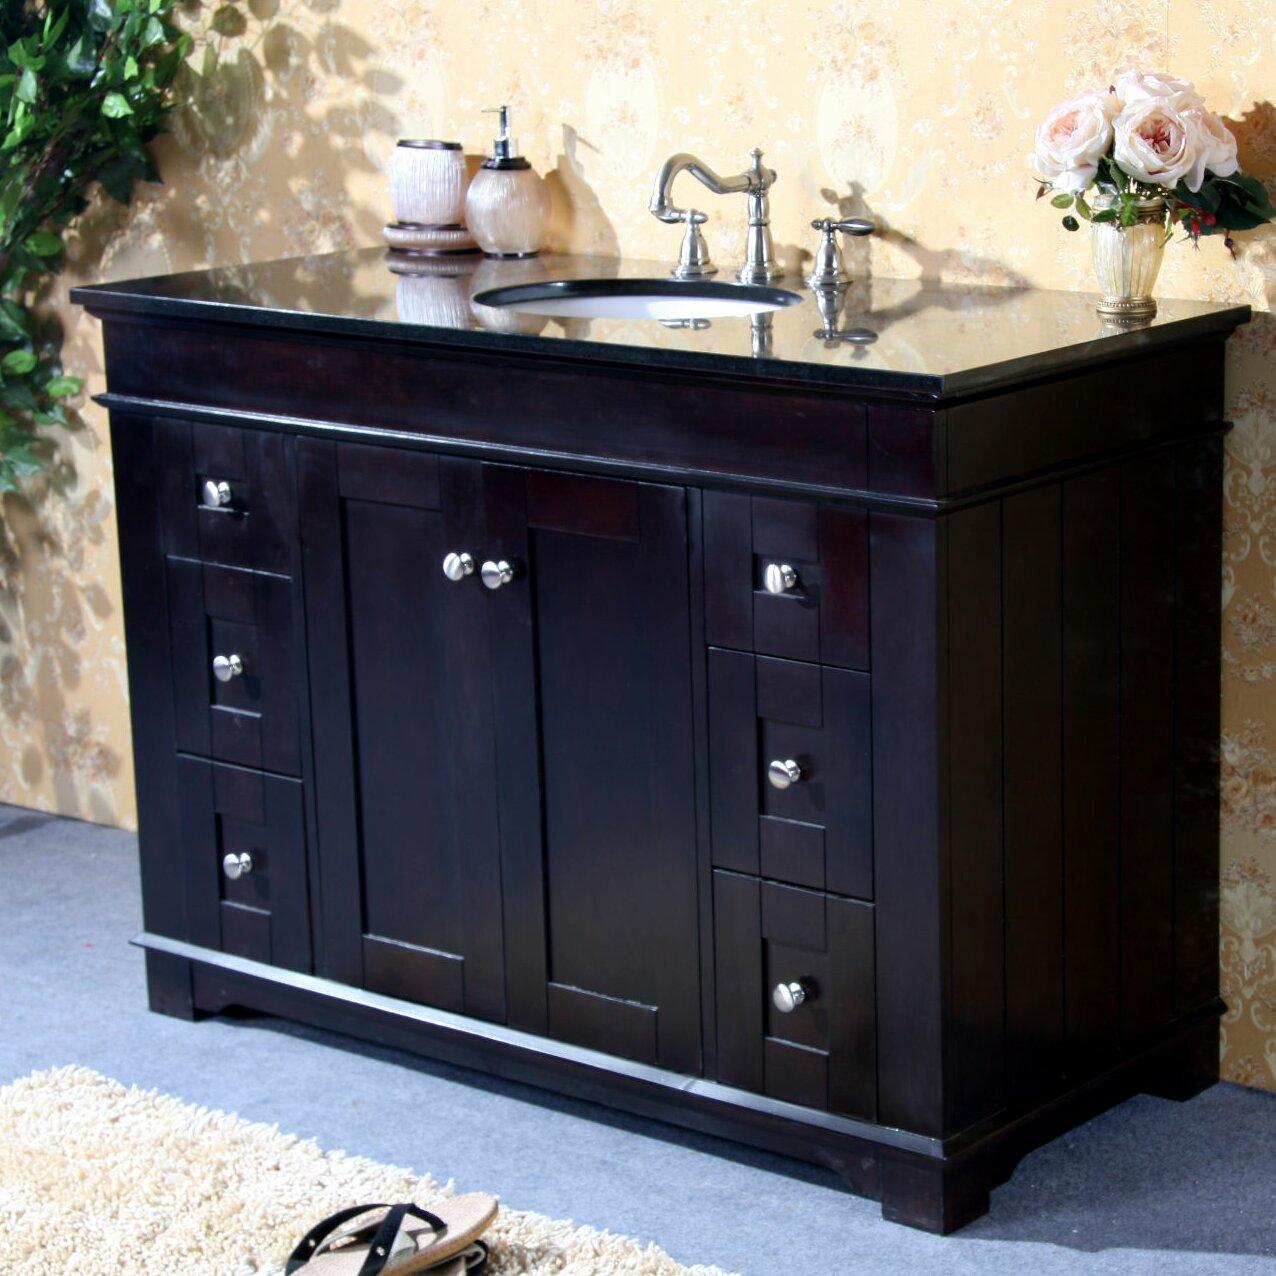 Legion furniture 48 single bathroom vanity set reviews for Bathroom furniture sets